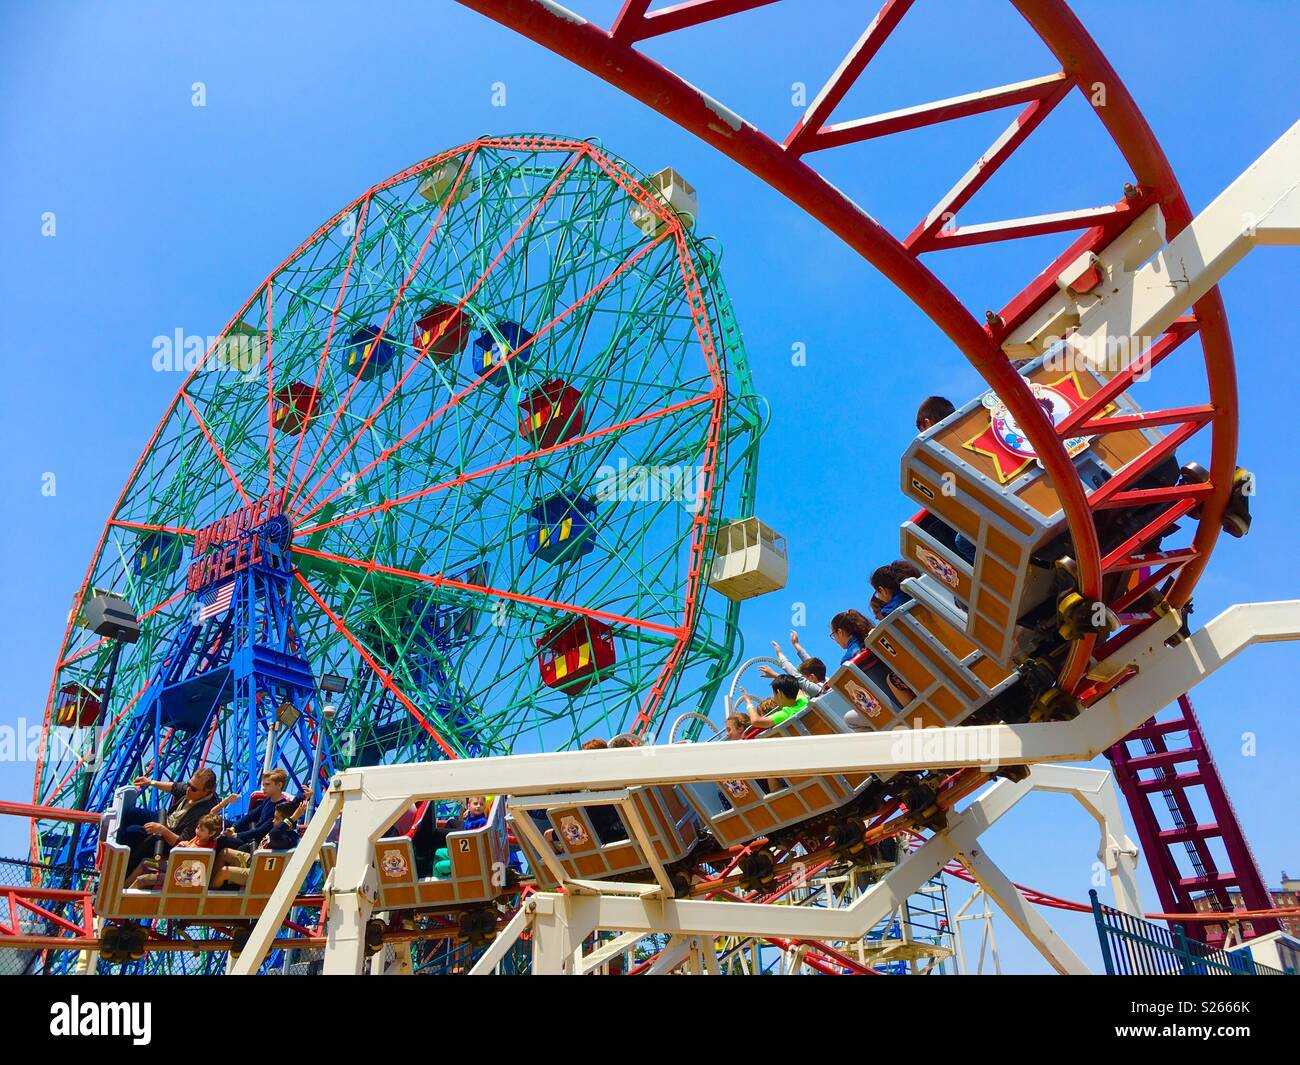 Fahrten auf Coney Island, New York Stockbild